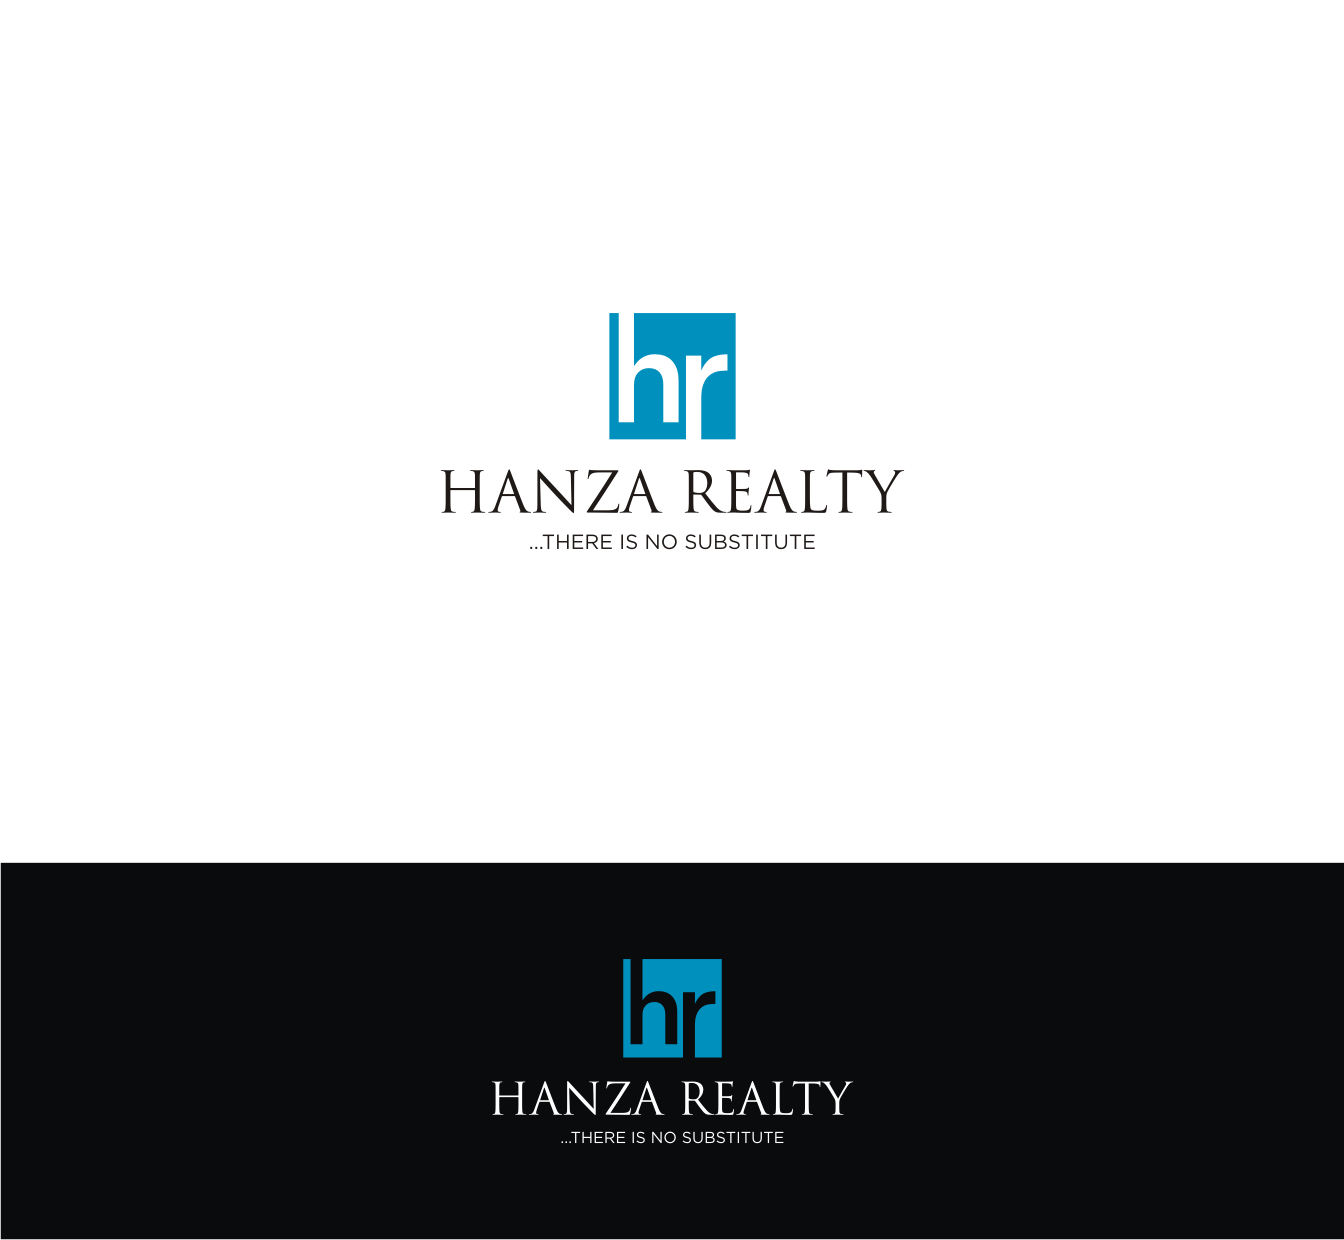 Logo Design by Sigitumarali Sigit - Entry No. 292 in the Logo Design Contest Logo Design for Hanza Realty.